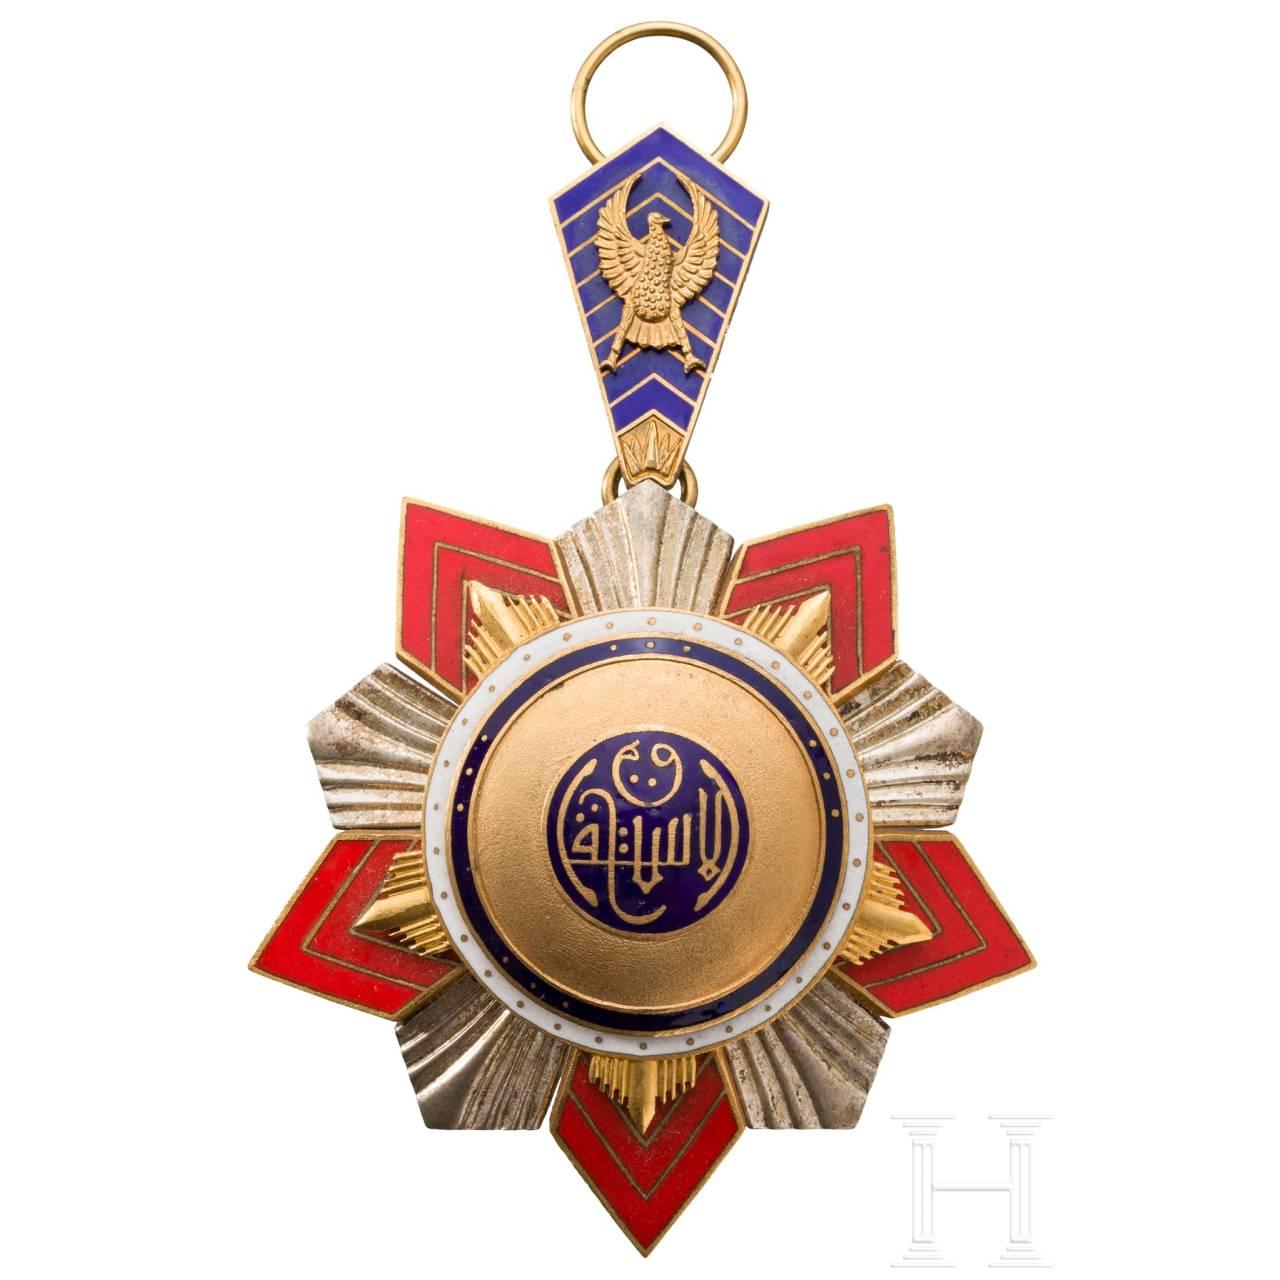 Ägypten - Unabhängigkeitsorden (Istiklal-Orden) - Großkreuz